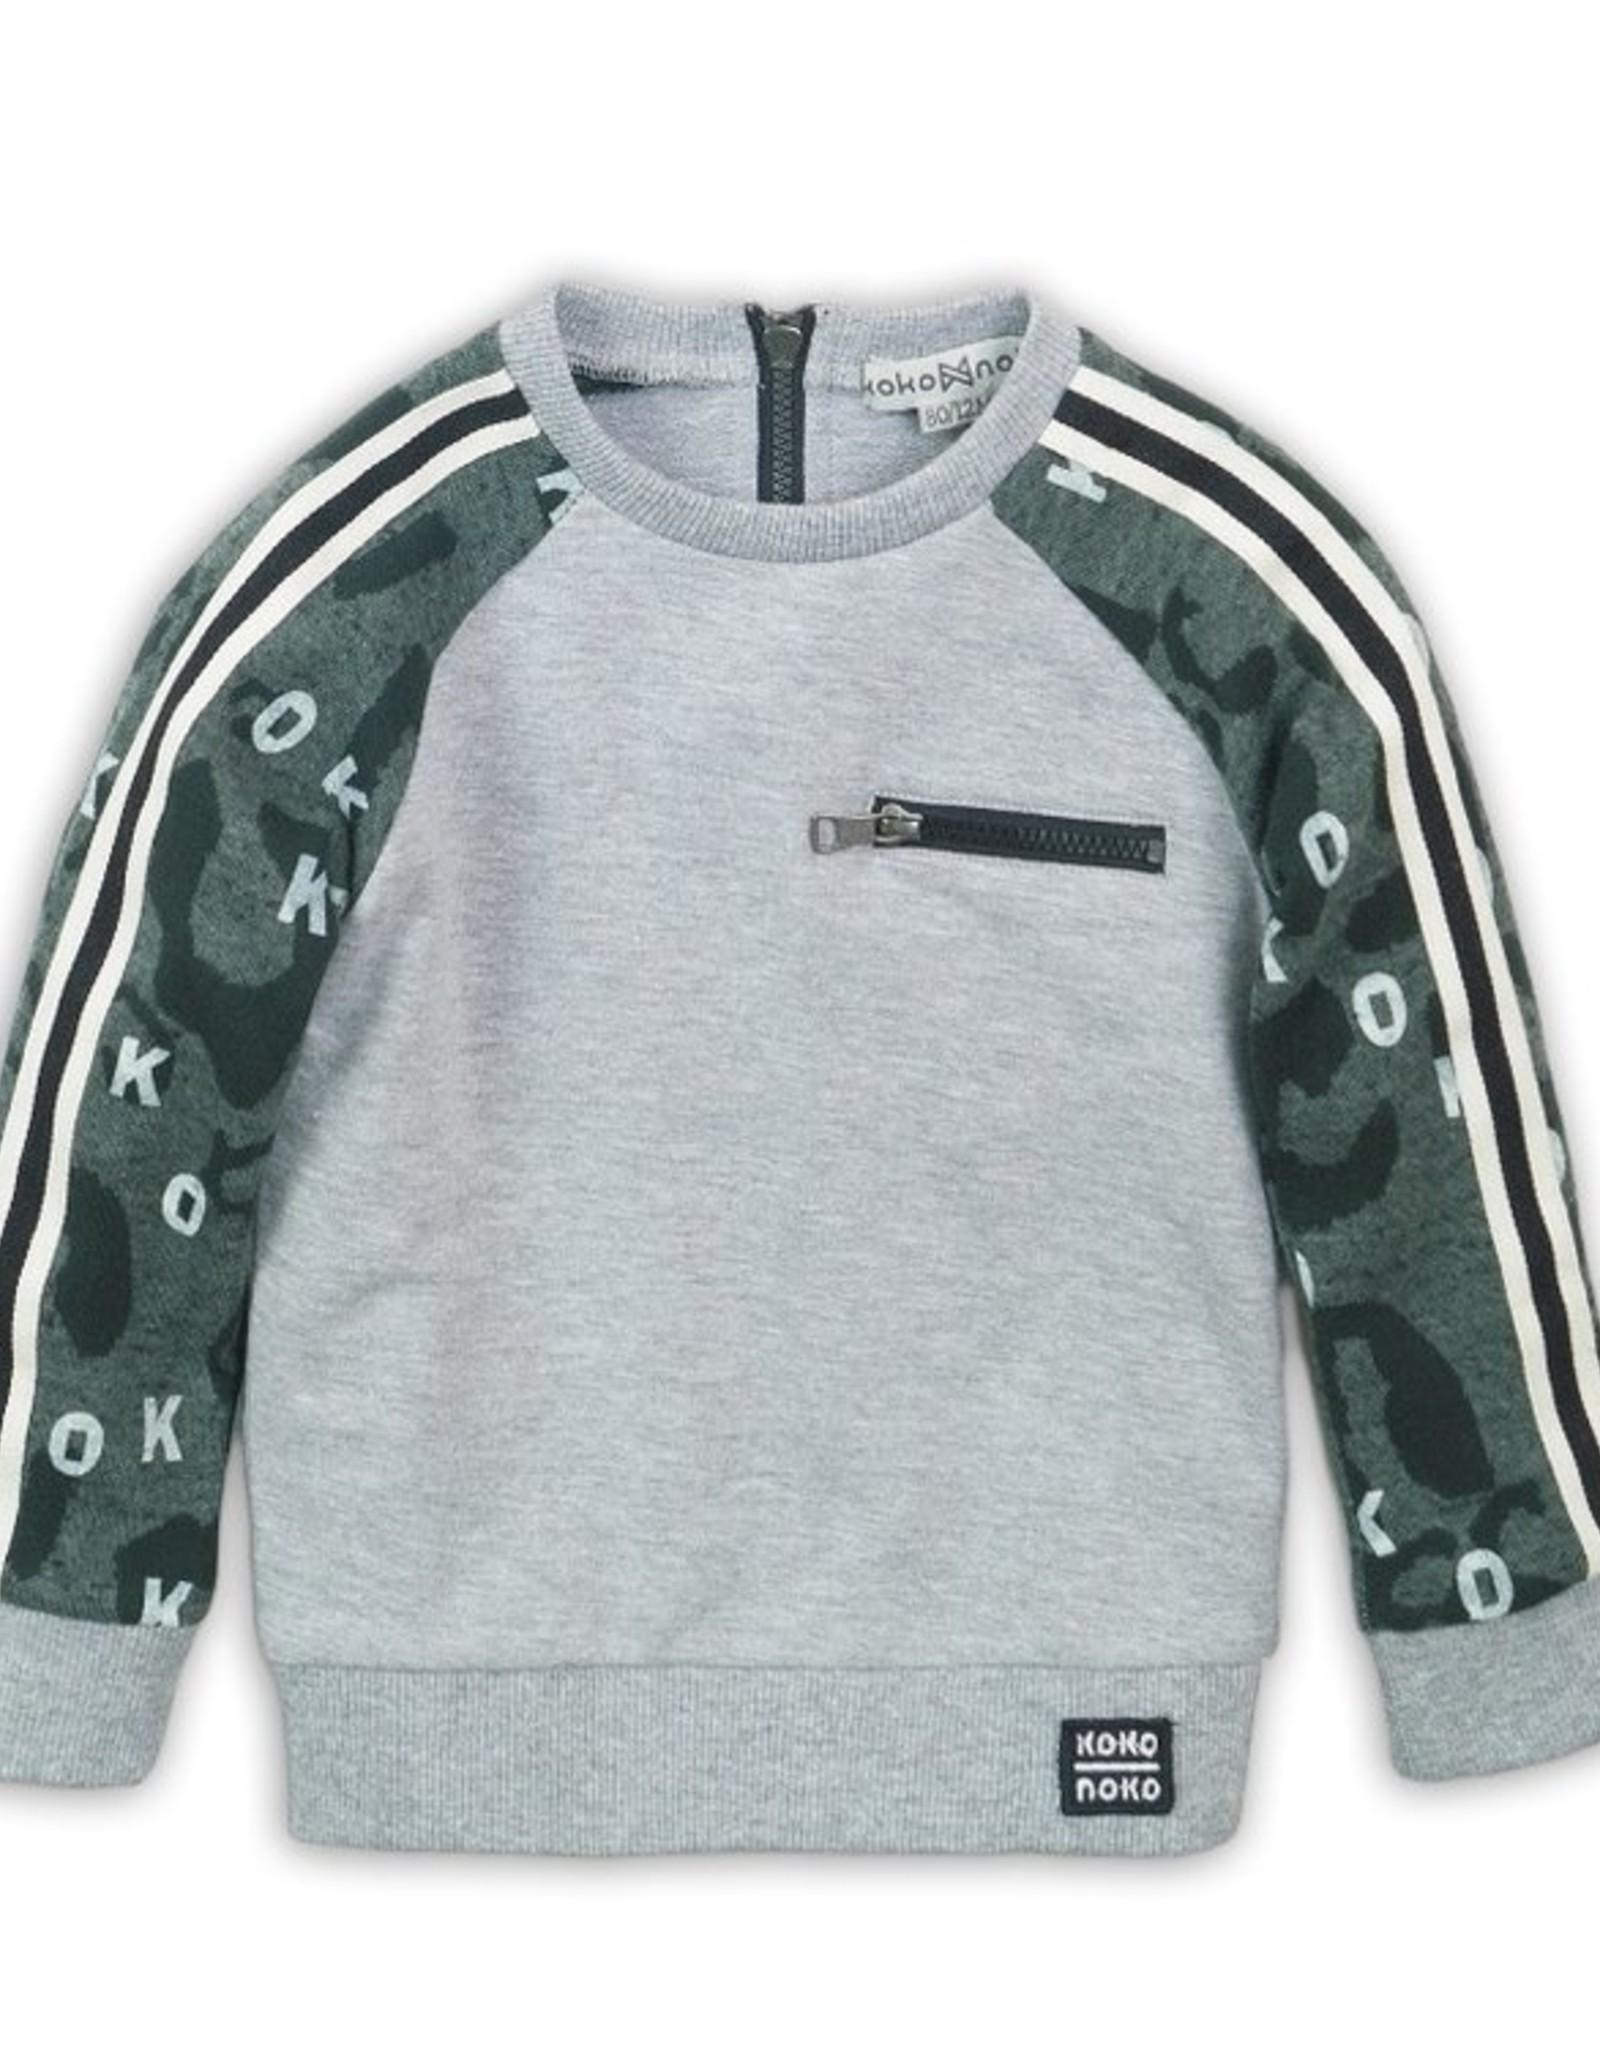 Koko Noko FA20 Grey Sweatshirt w/ Zip